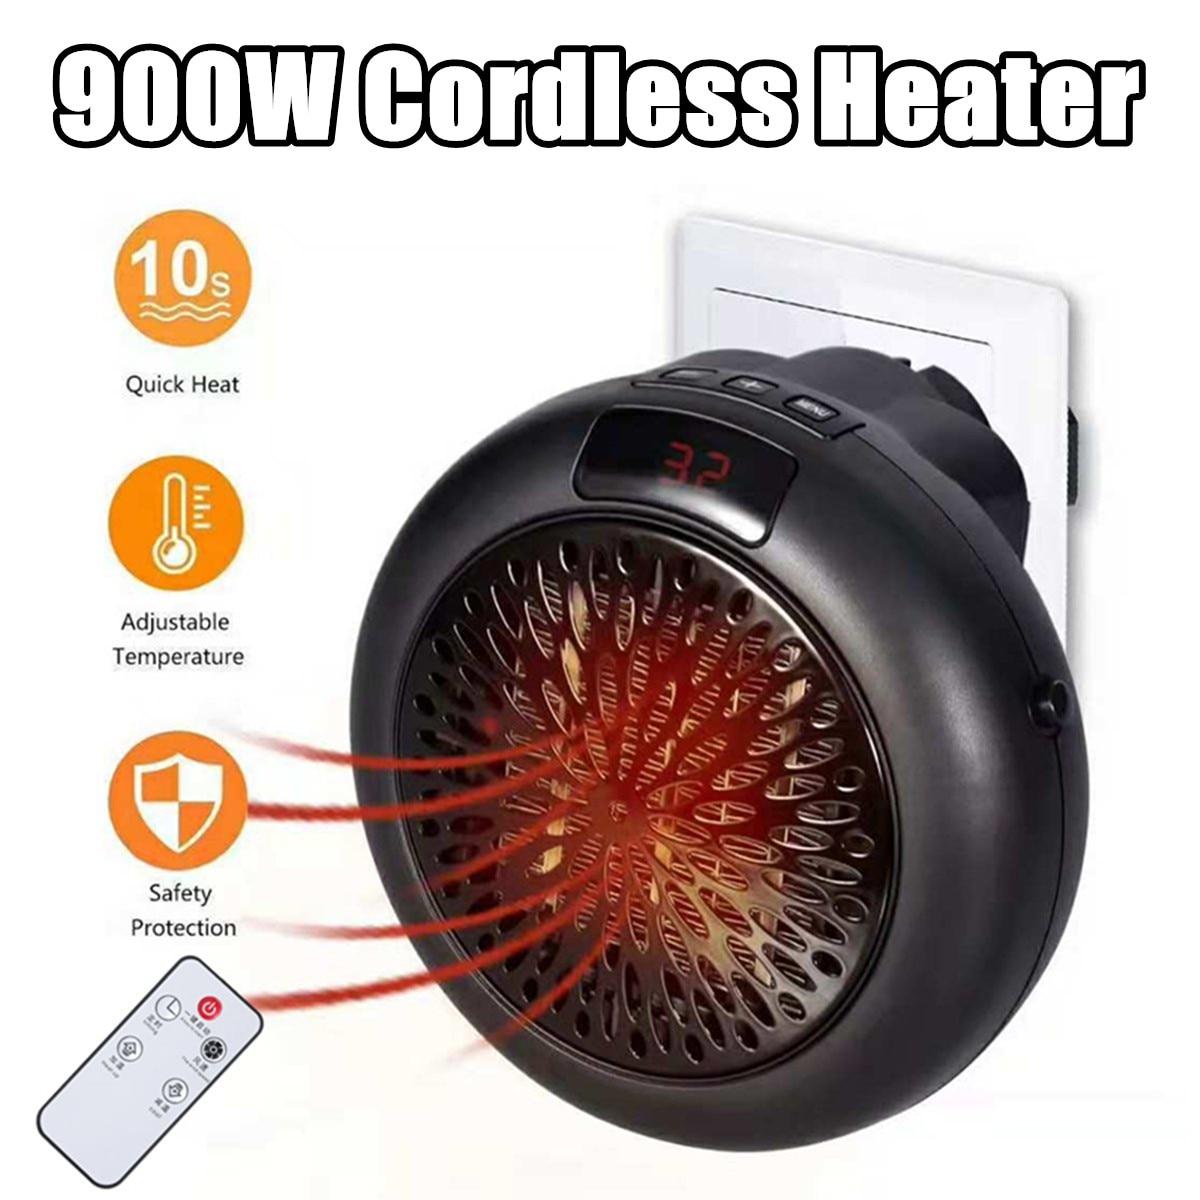 900W Electric Heater Mini Fan Heater Desktop Household Wall Handy Heating Stove Radiator Winter Body Warmer Ceramic Machine